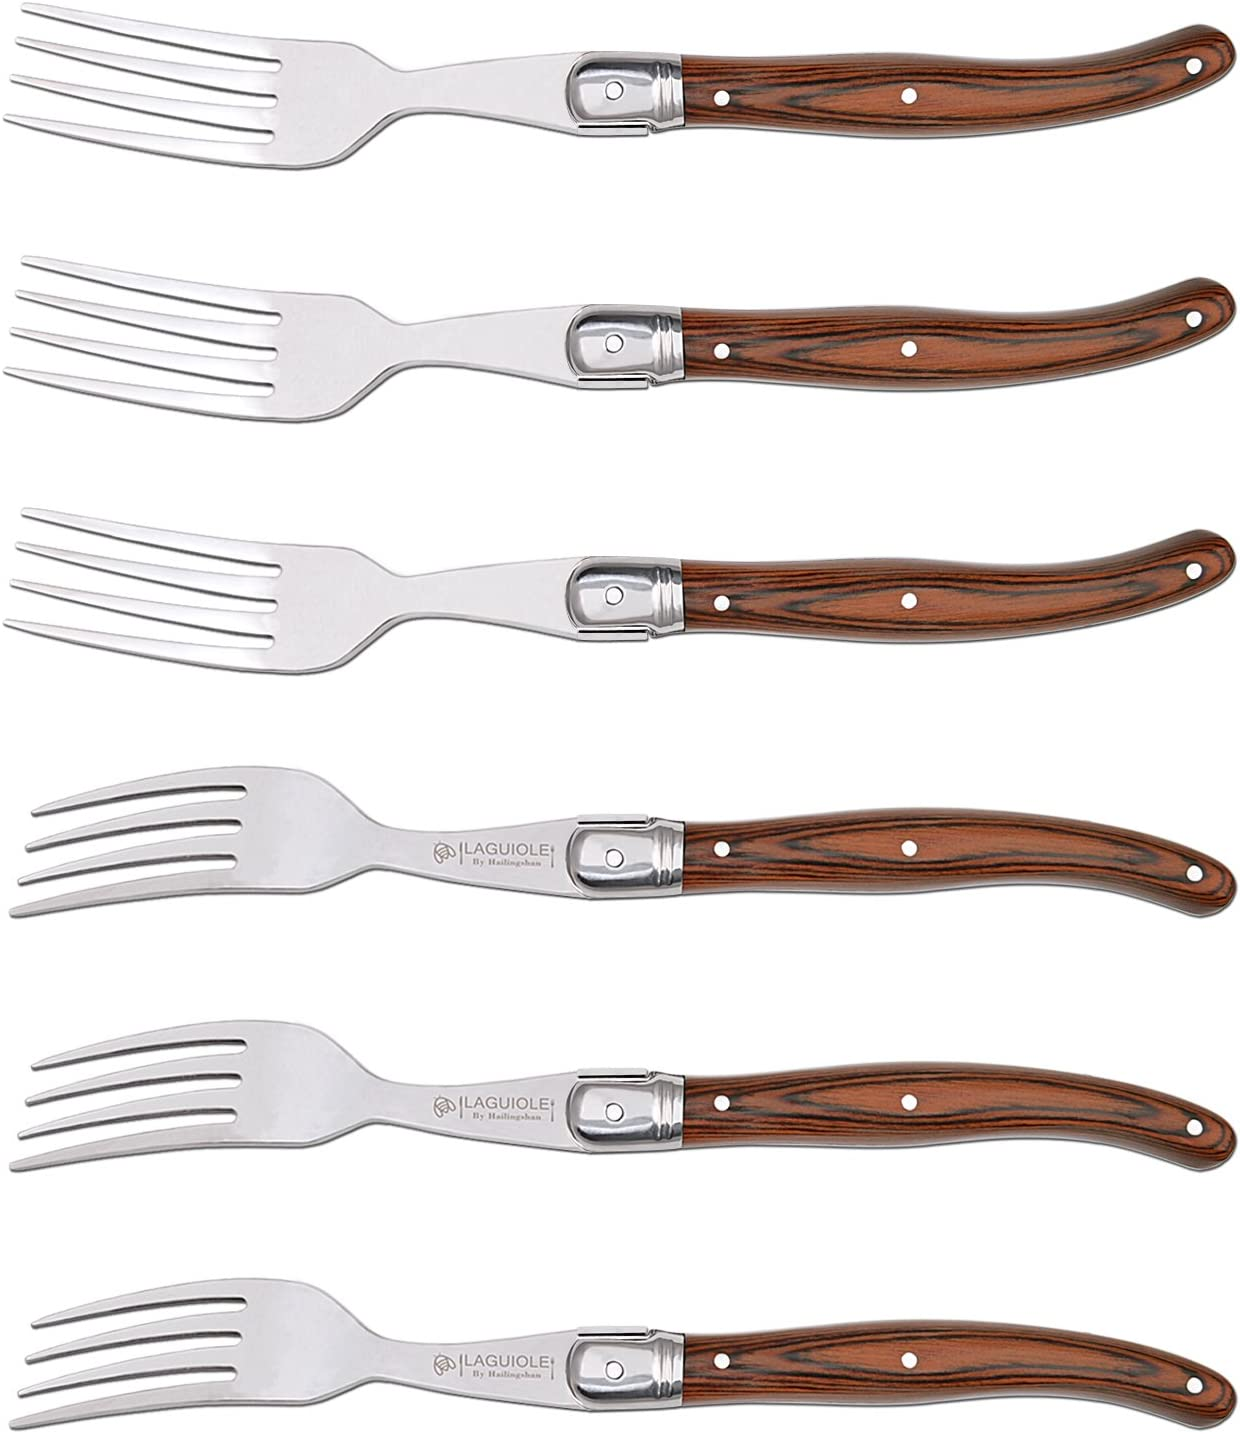 Forks Set of 6, Hailingshan Heavy Duty Stainless Steel Dinner Table Flatware Set, Laguiole Premium Kitchen Cutlery Utensils Salad Meat Steak Fork Mirror Finish Wooden Handle 23cm 6-Piece [Gift Box]